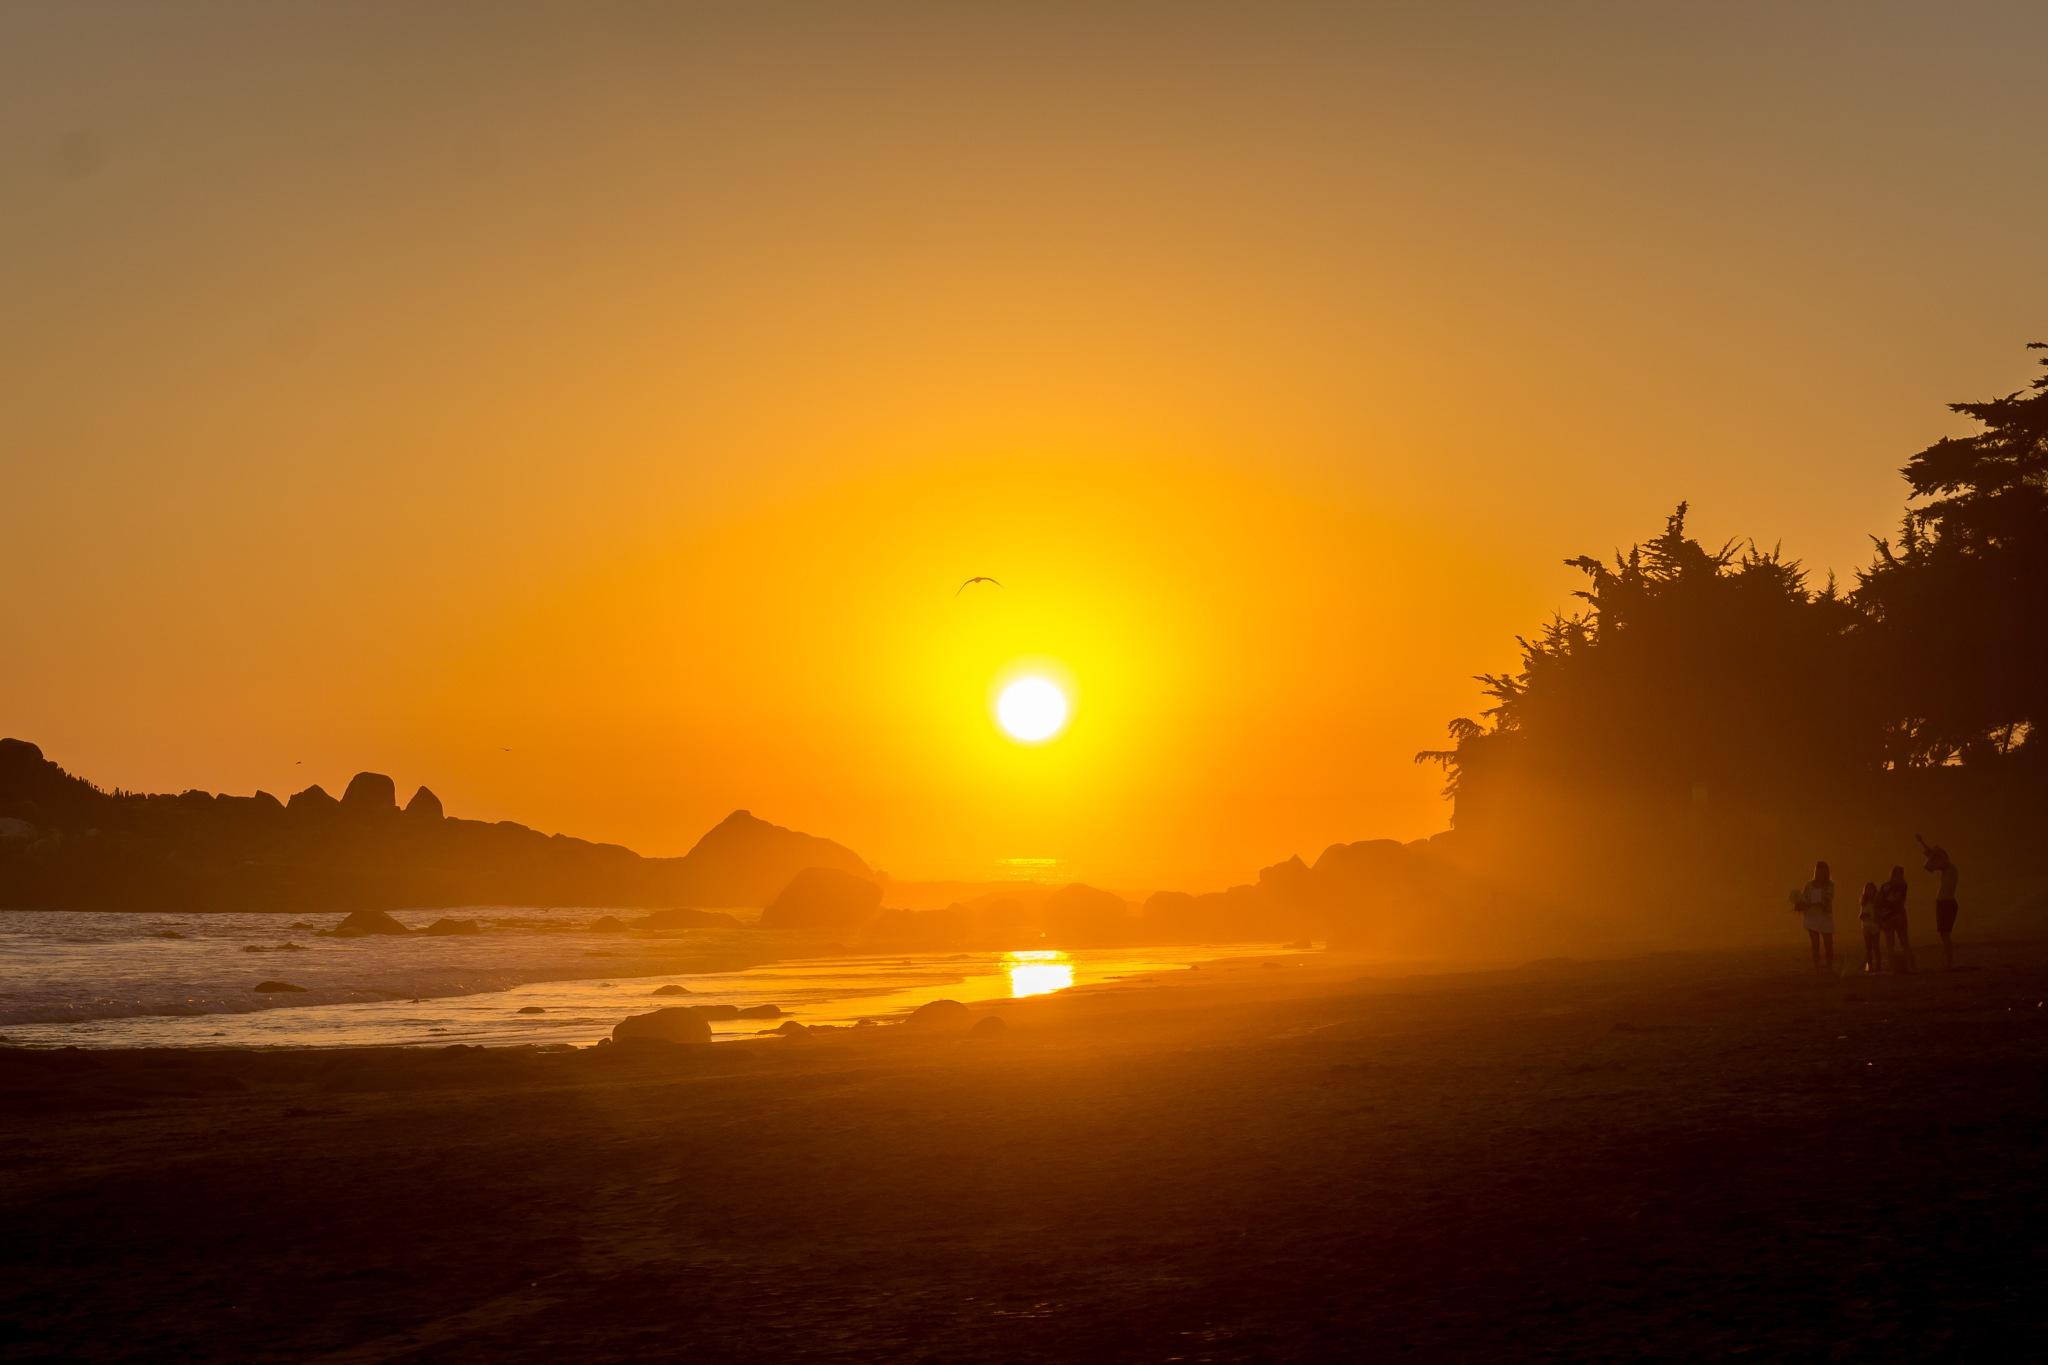 Romantic Sunset by Daniel M.